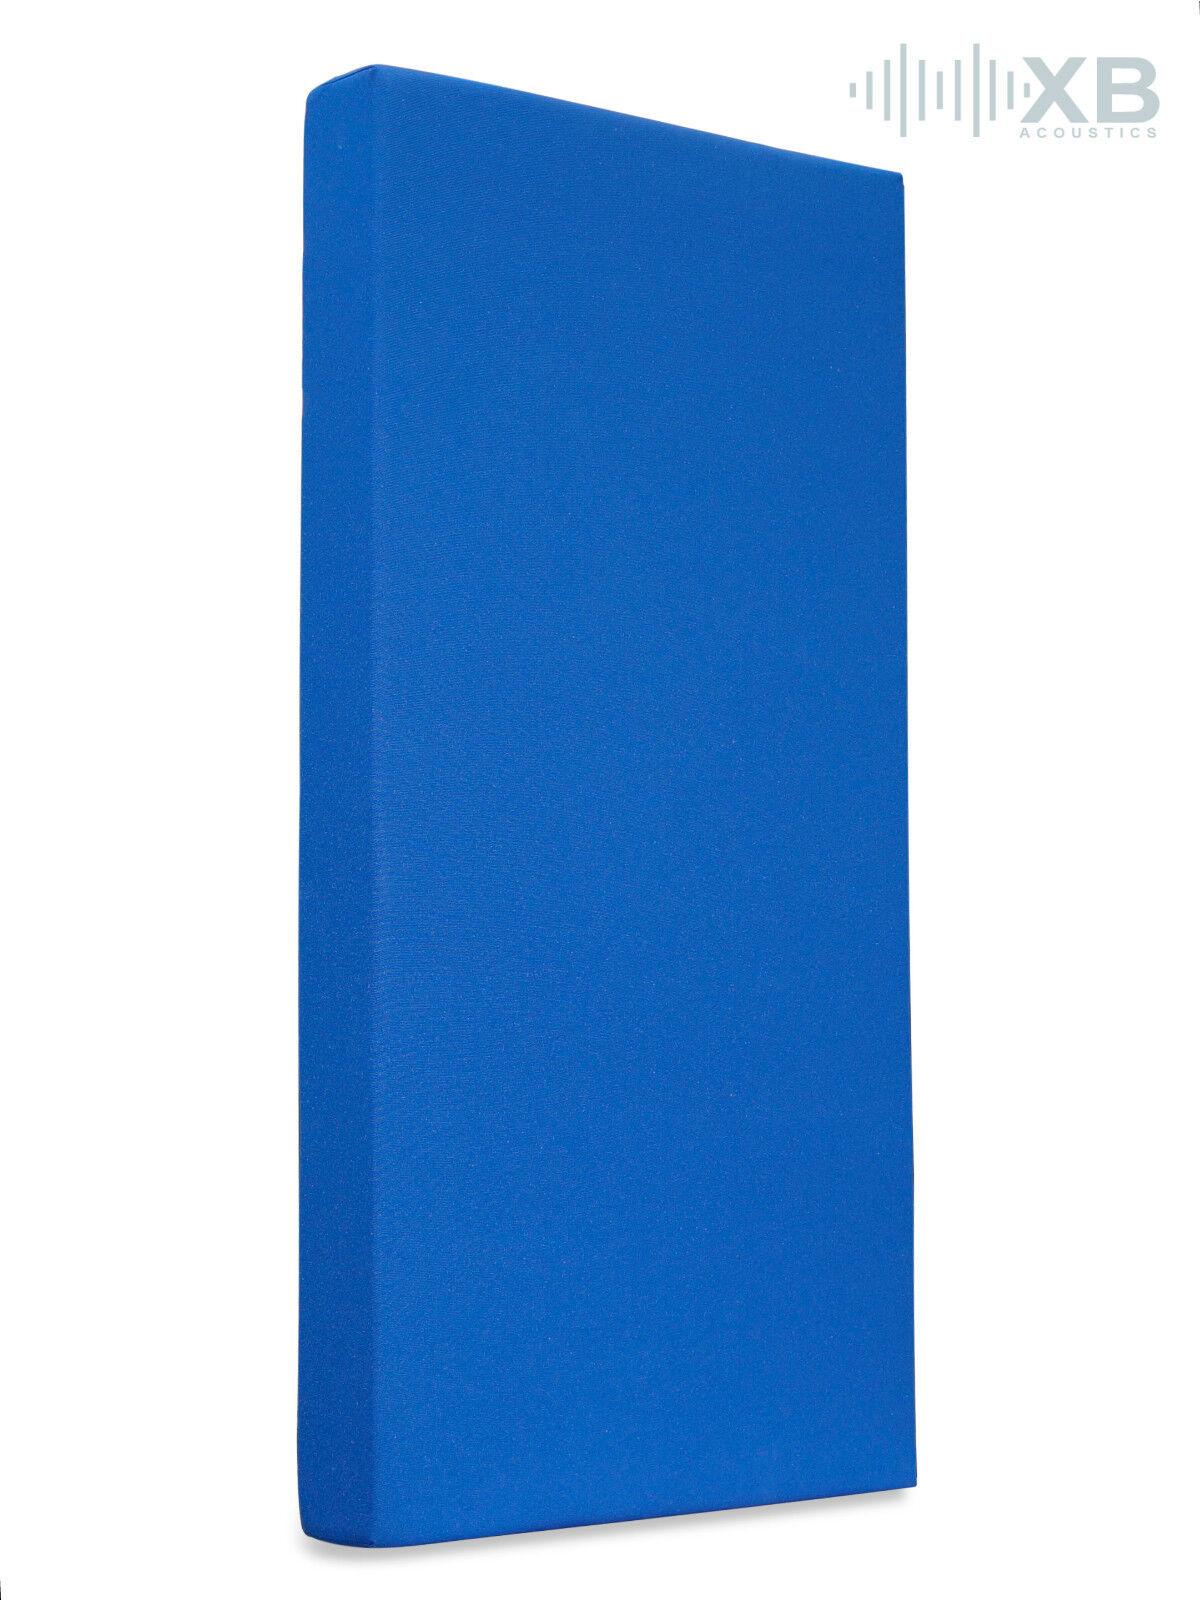 100x50x12cm Scahallabsorber (Schalldämmung) aus Basotect® Tonstudio Blau